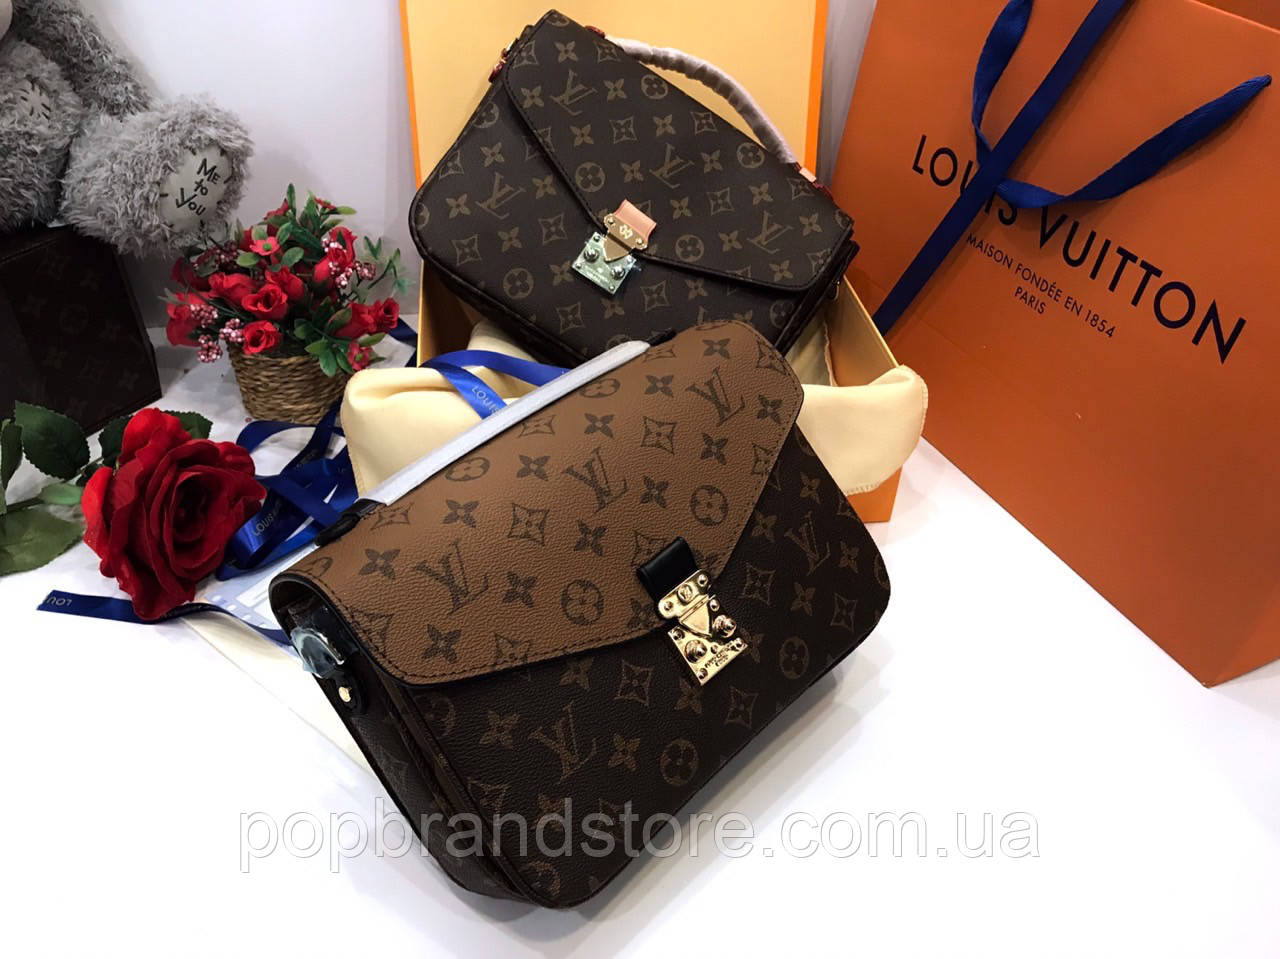 Женская сумочка LOUIS VUITTON Pochette Metis LUX нат. кожа (реплика ... 684b6f1dd81